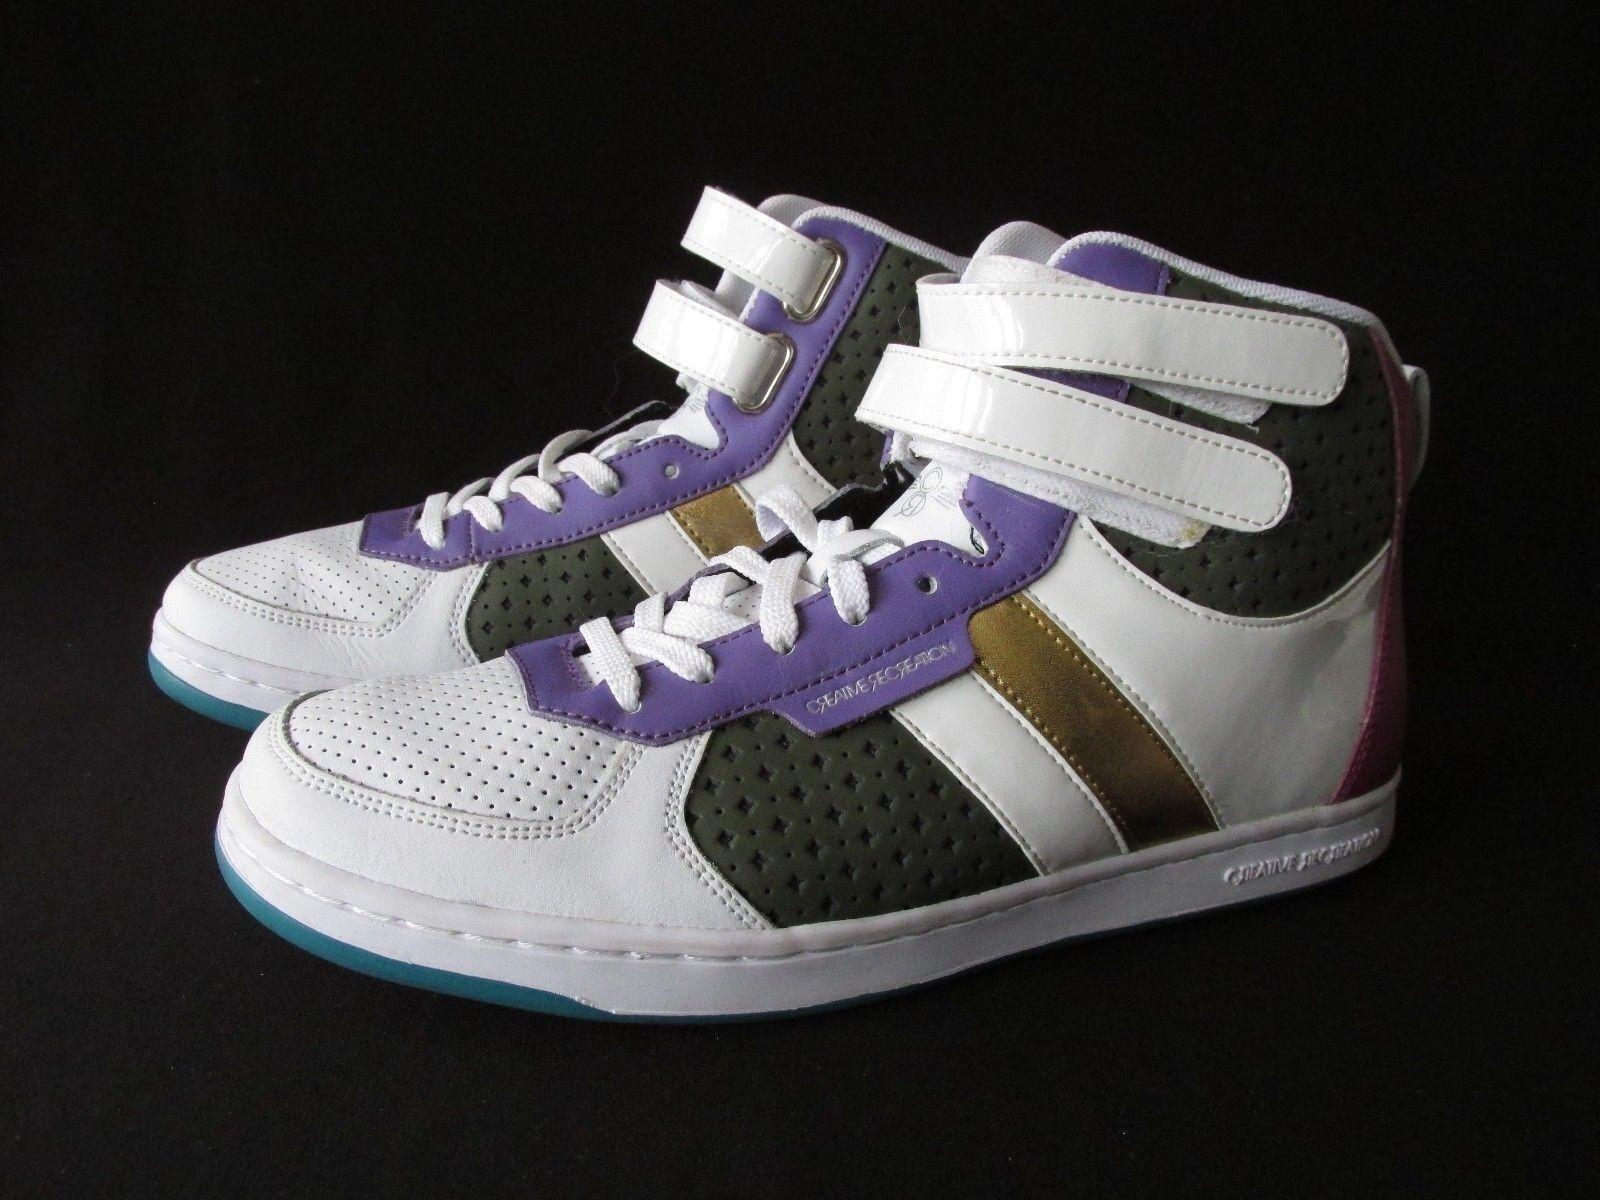 Creative Recreation Hi-Top Sneaker Chaussures Lace Up Velcro Femme US 10M EUR 42L